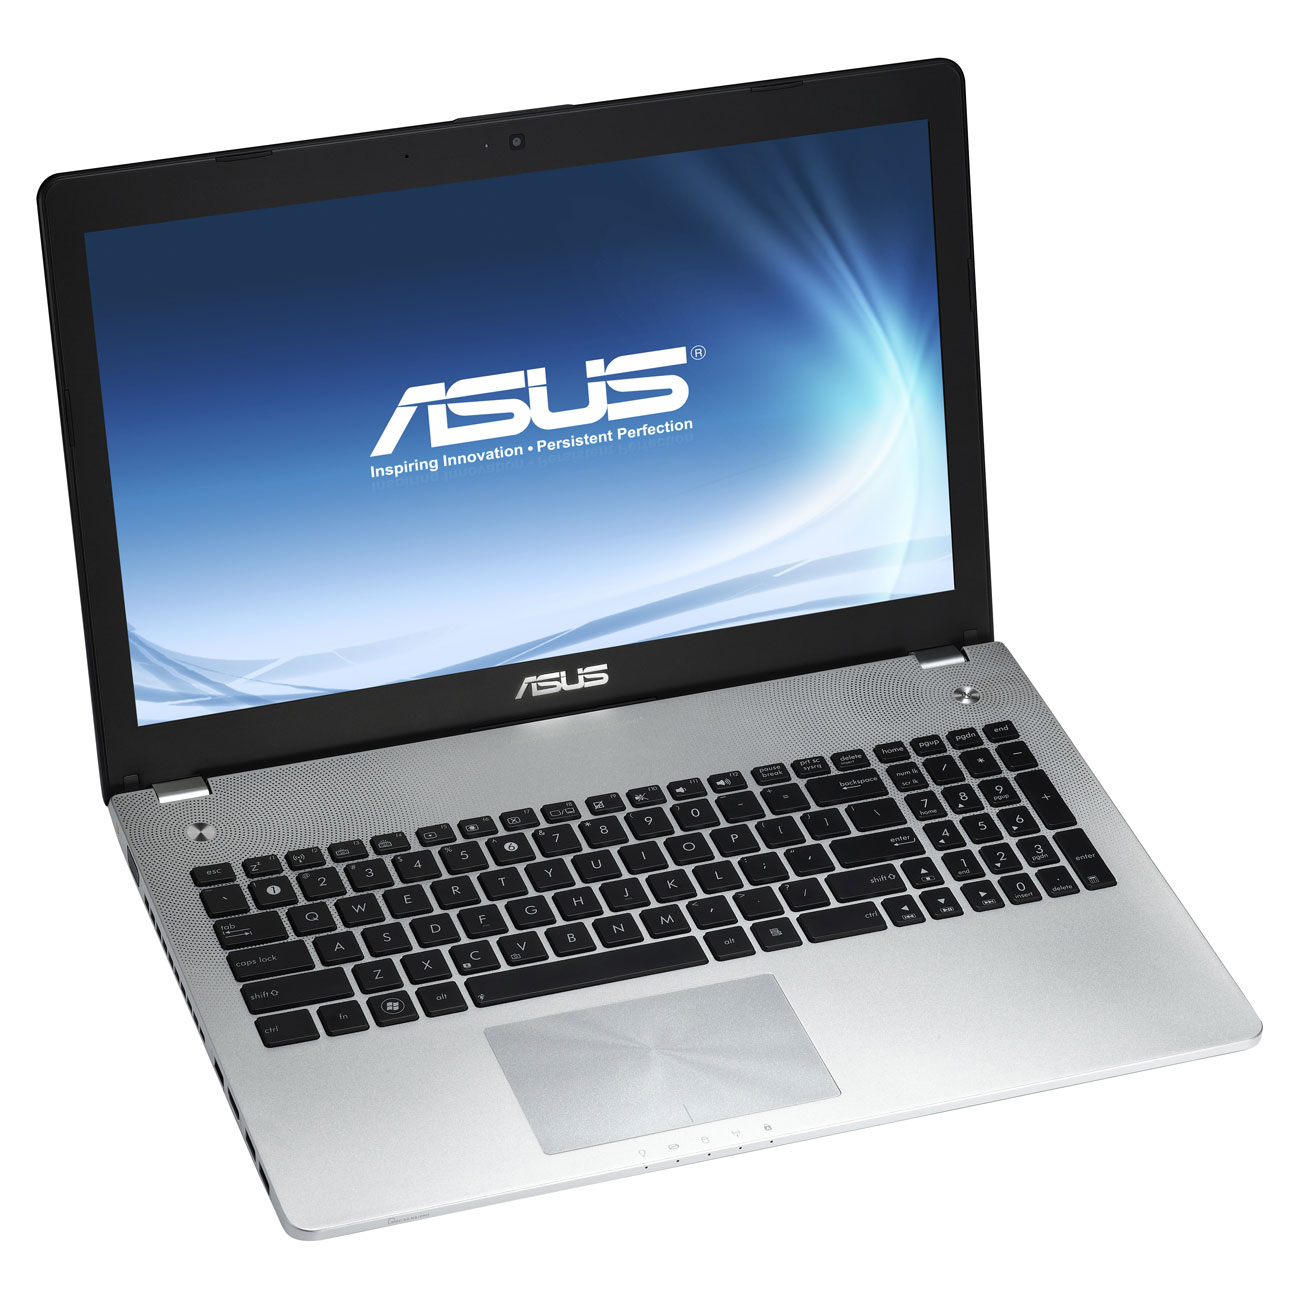 "PC portable ASUS N56JR-CN198H Intel Core i7-4700HQ 8 Go 750 Go 15.6"" LED NVIDIA GeForce GTX 760M Graveur DVD Wi-Fi N/Bluetooth Webcam Windows 8 64 bits (garantie constructeur 1 an)"